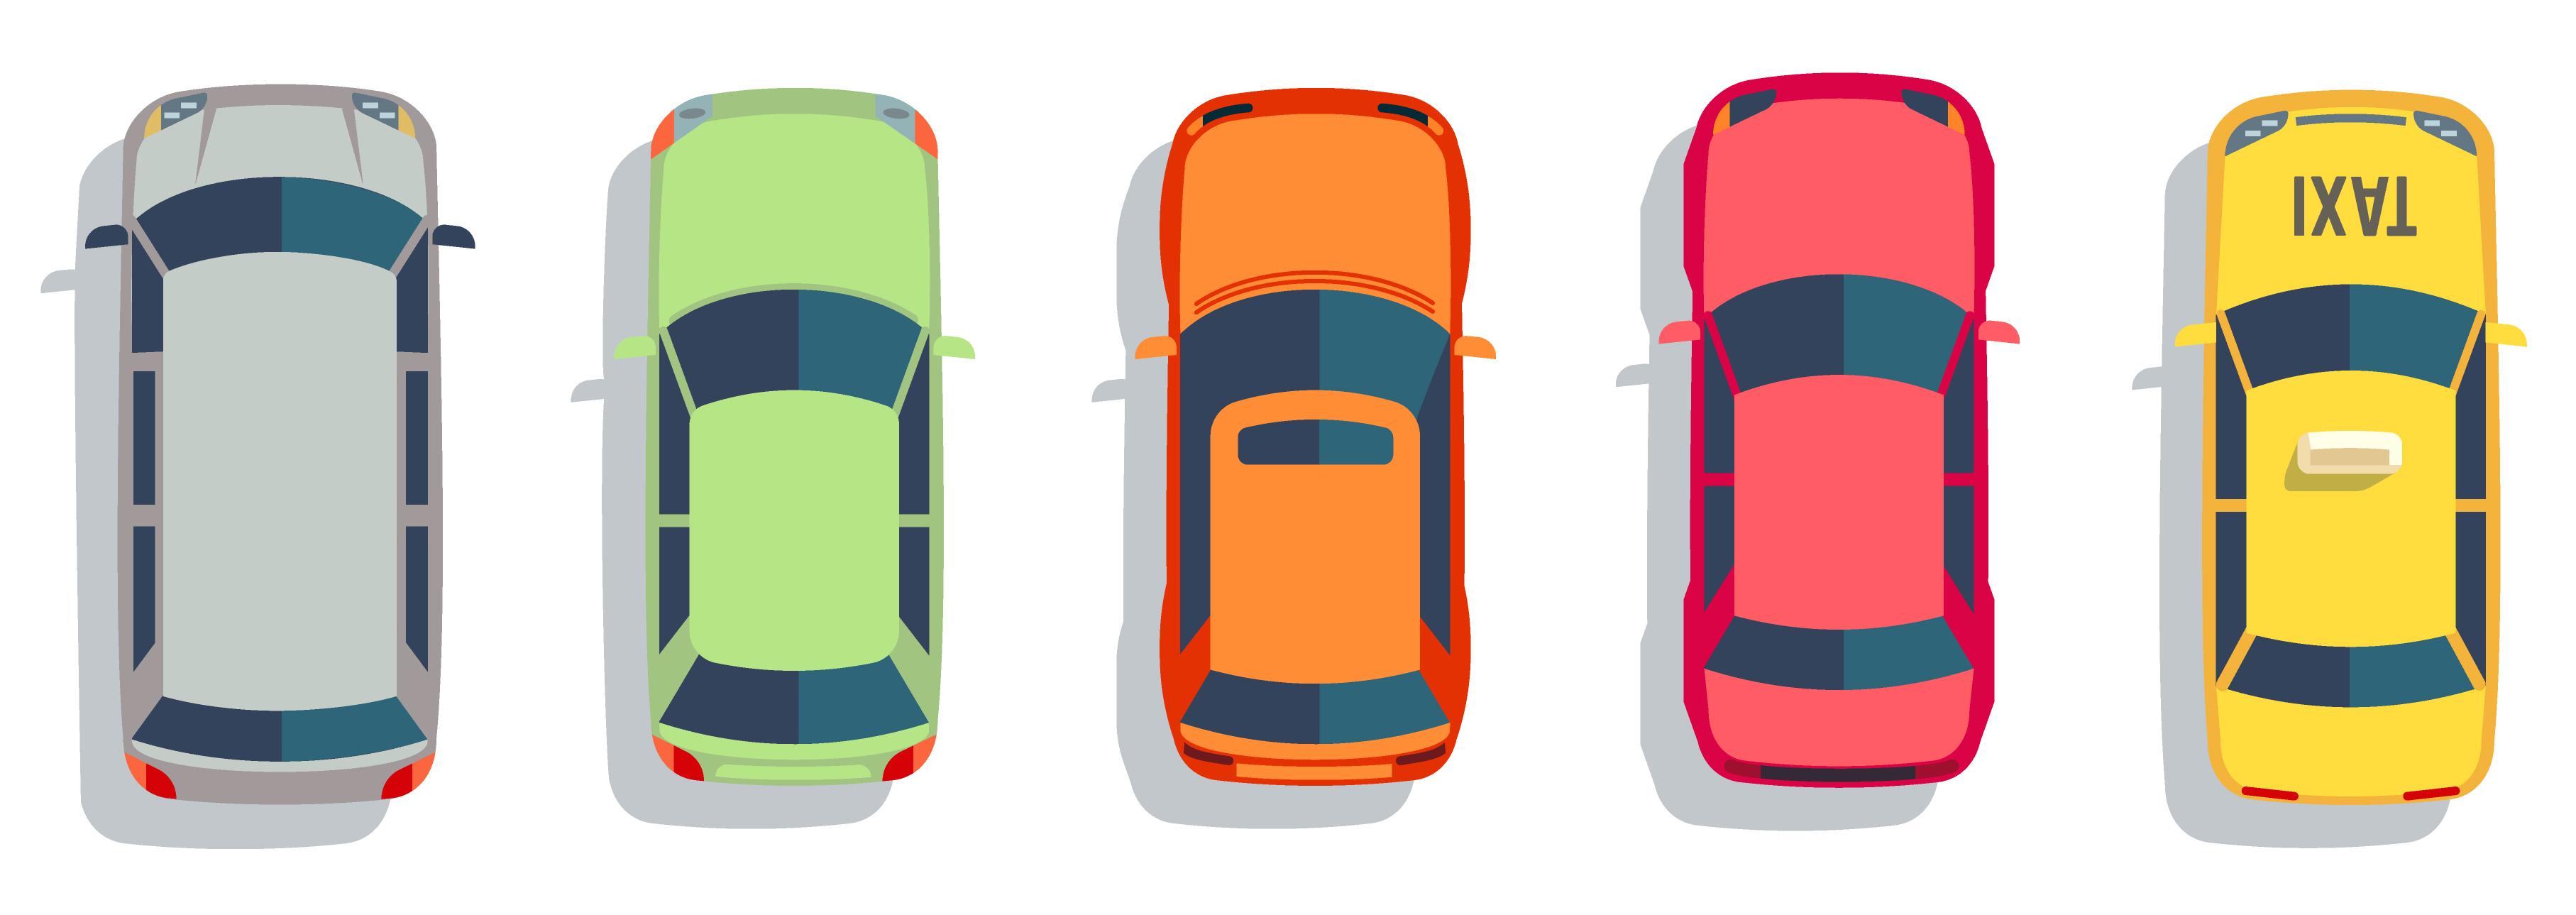 Cars, trucks, Uber, taxi